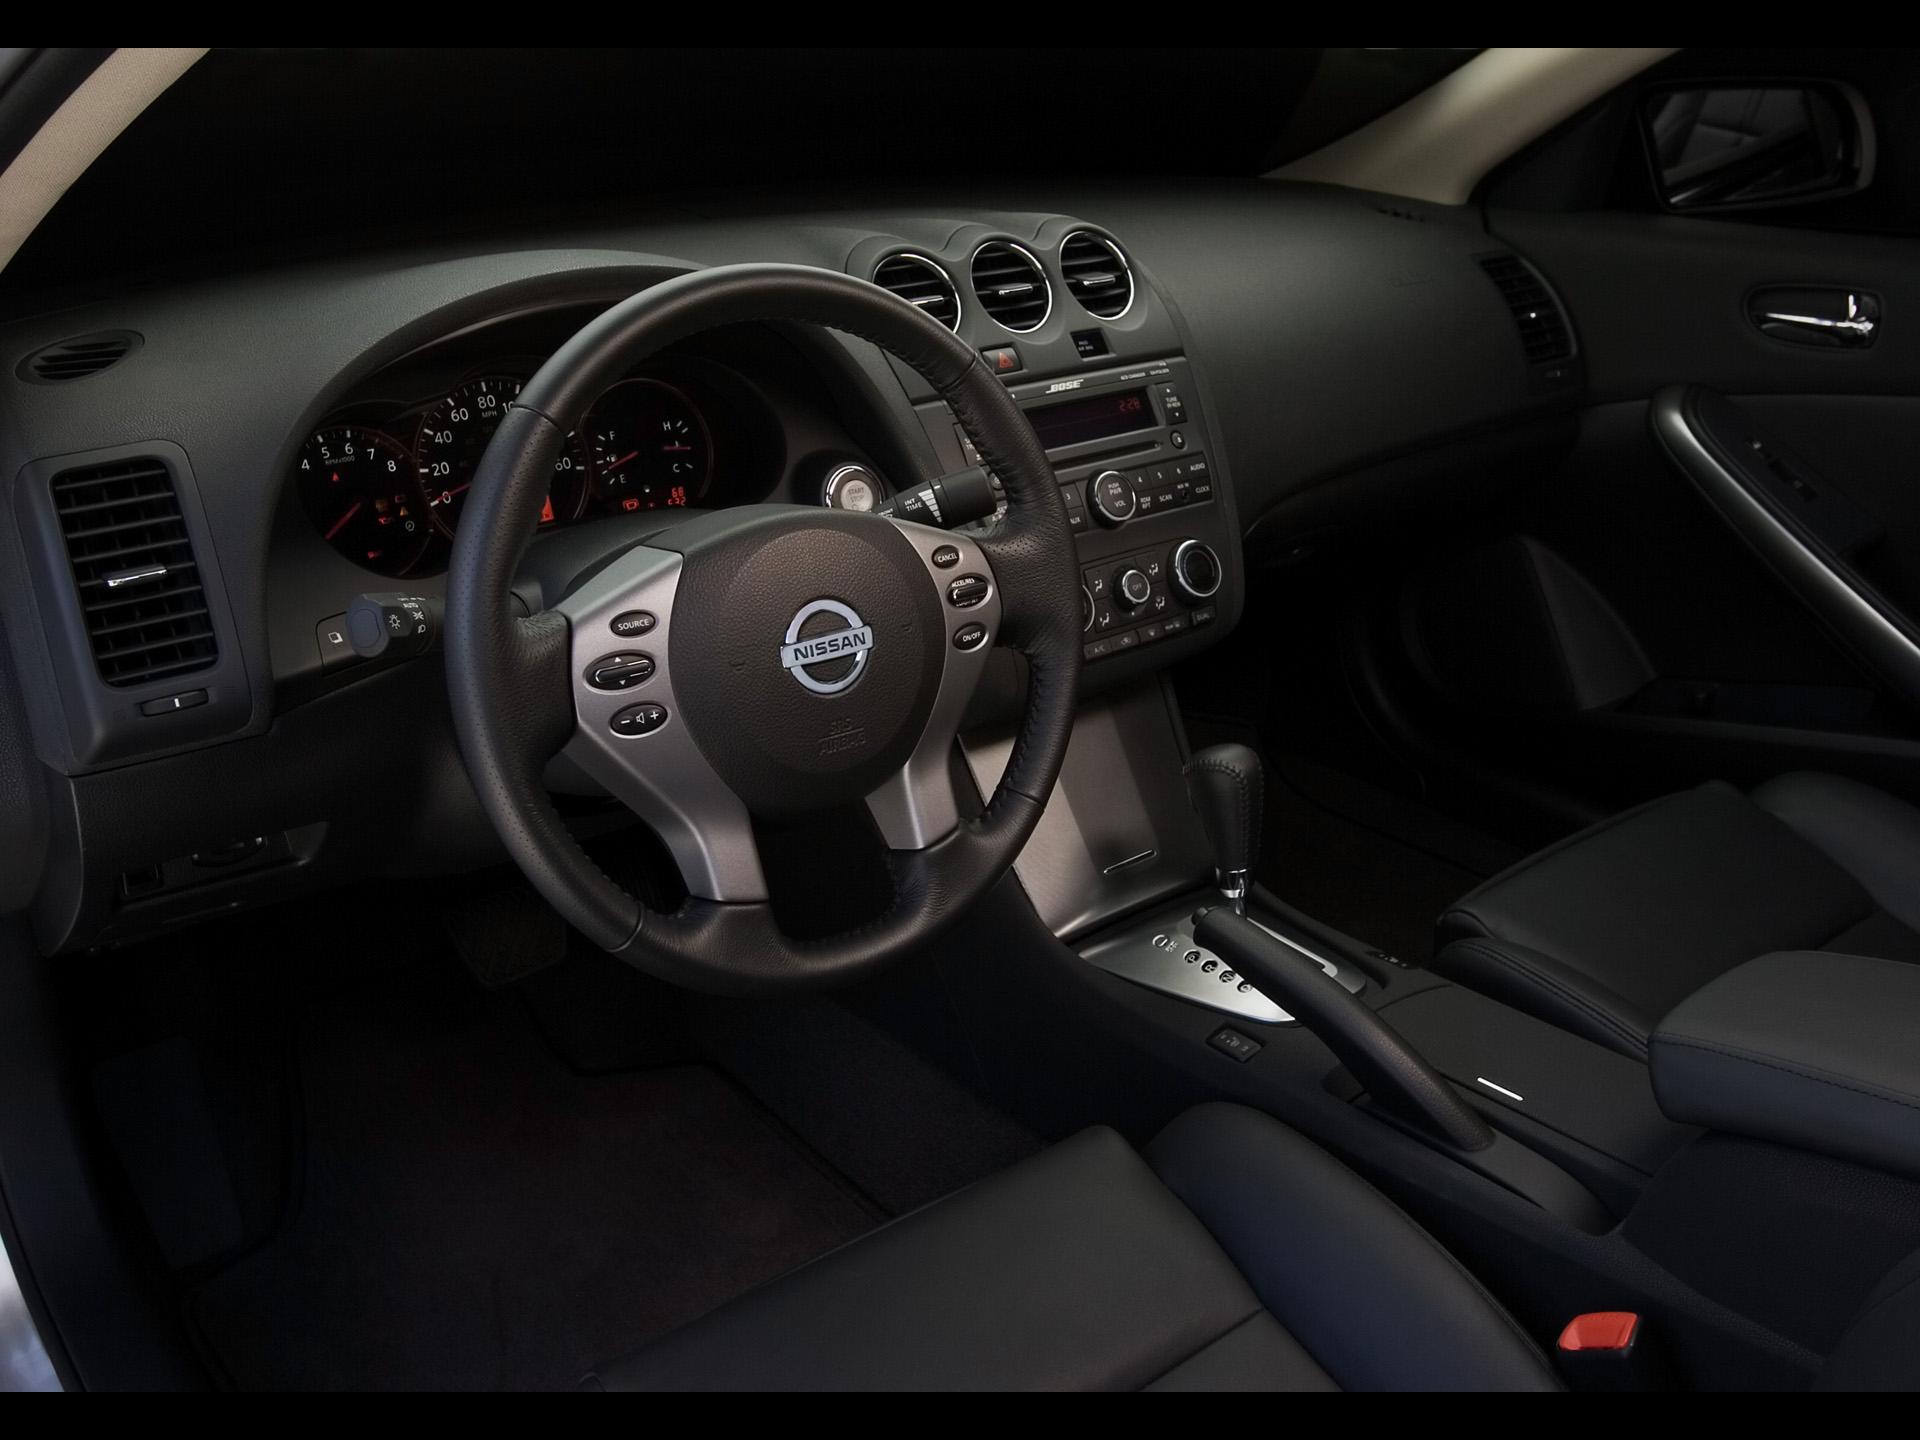 2008 Nissan Altima Image 20